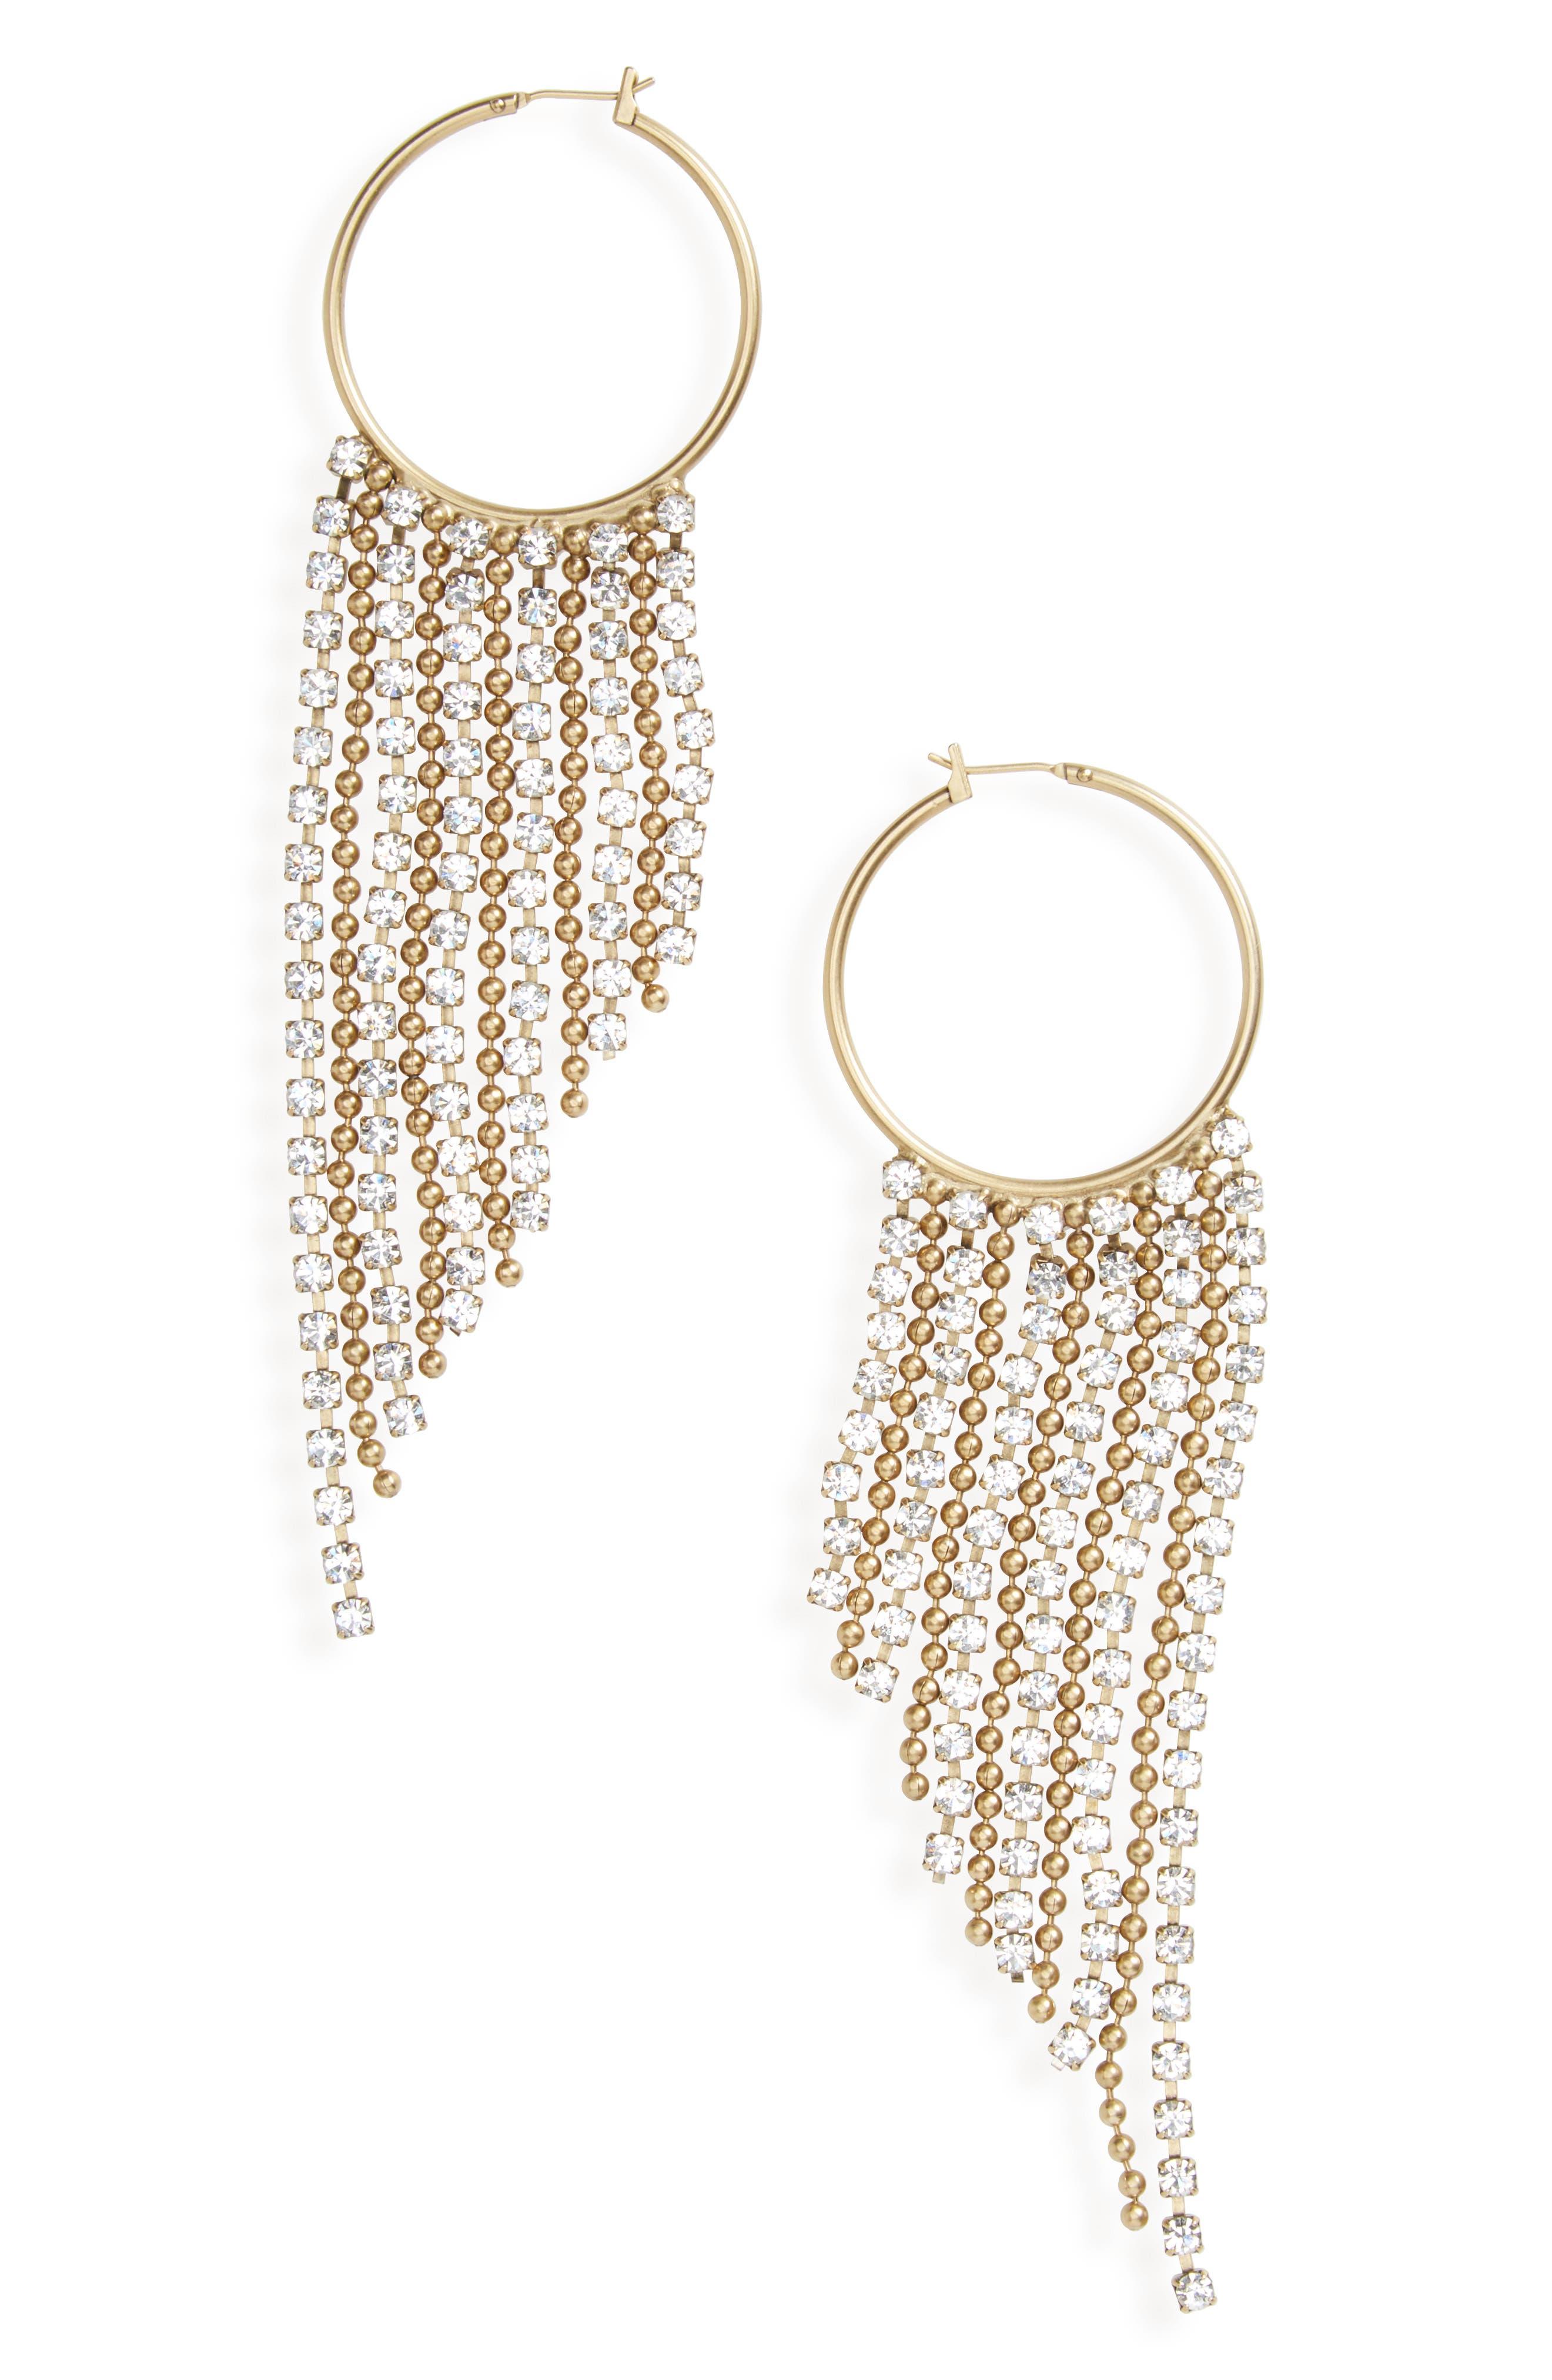 Loren Hope Joanna Fringe Hoop Earrings